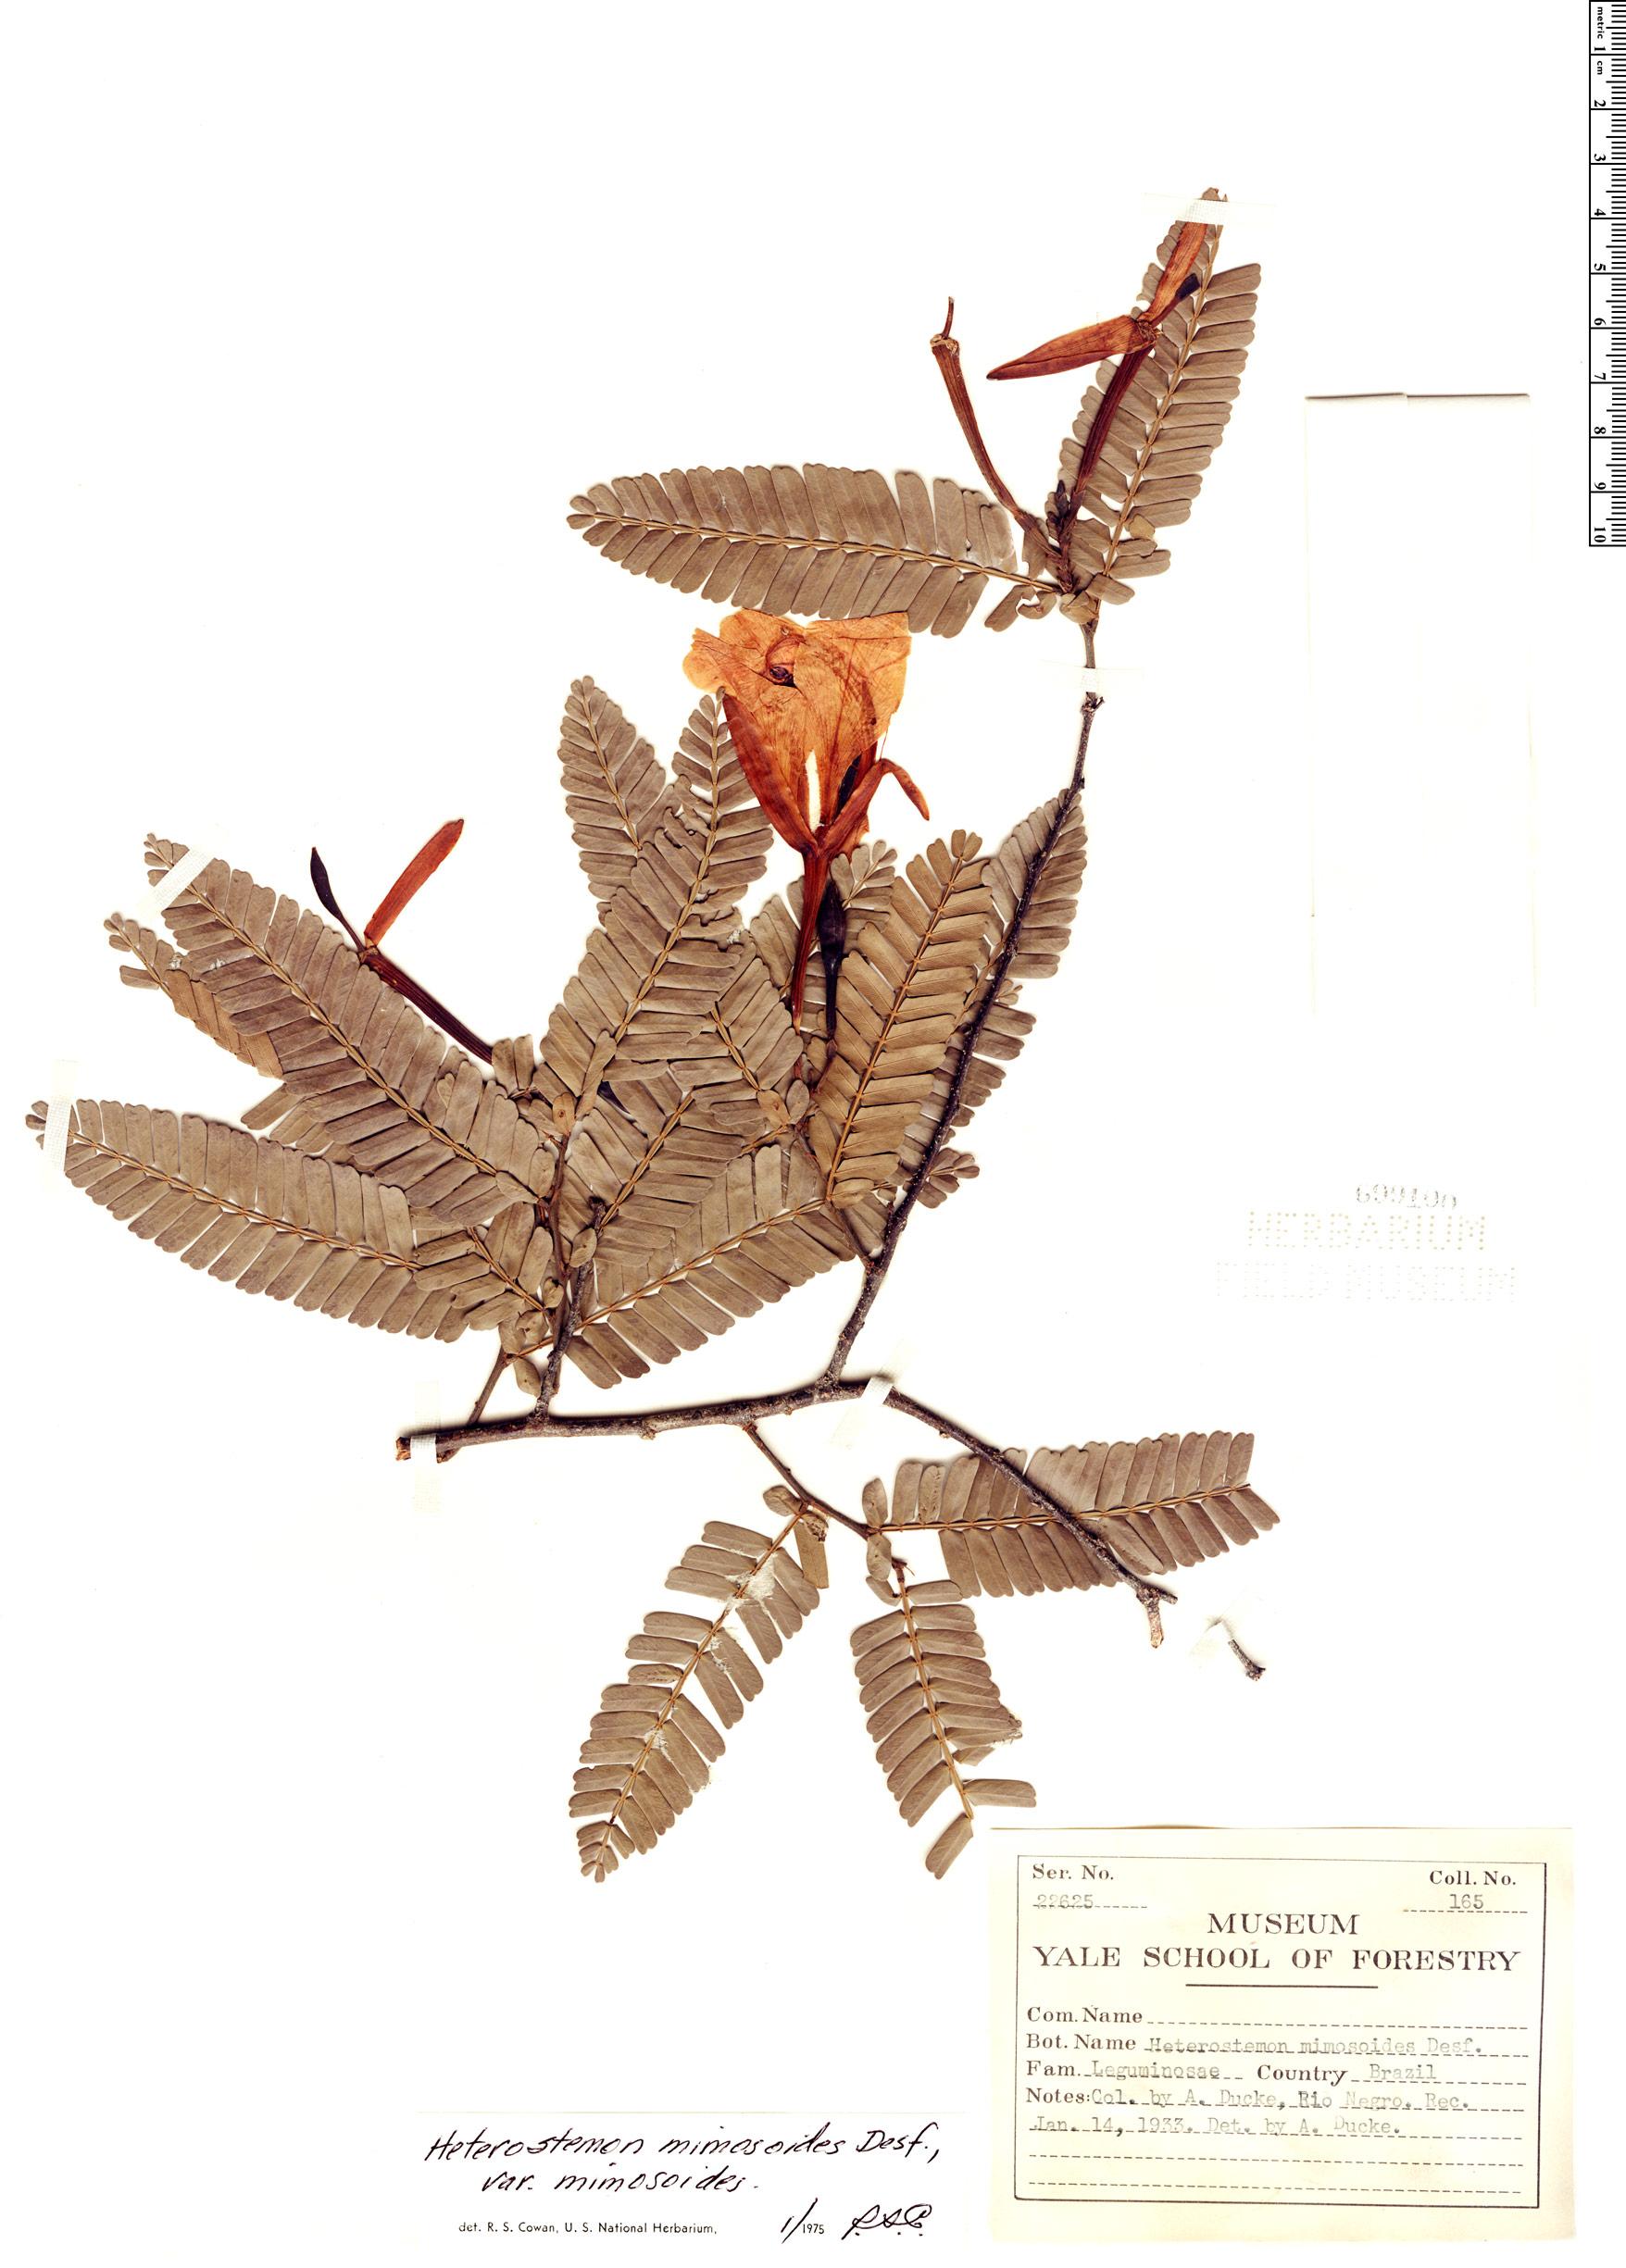 Specimen: Heterostemon mimosoides